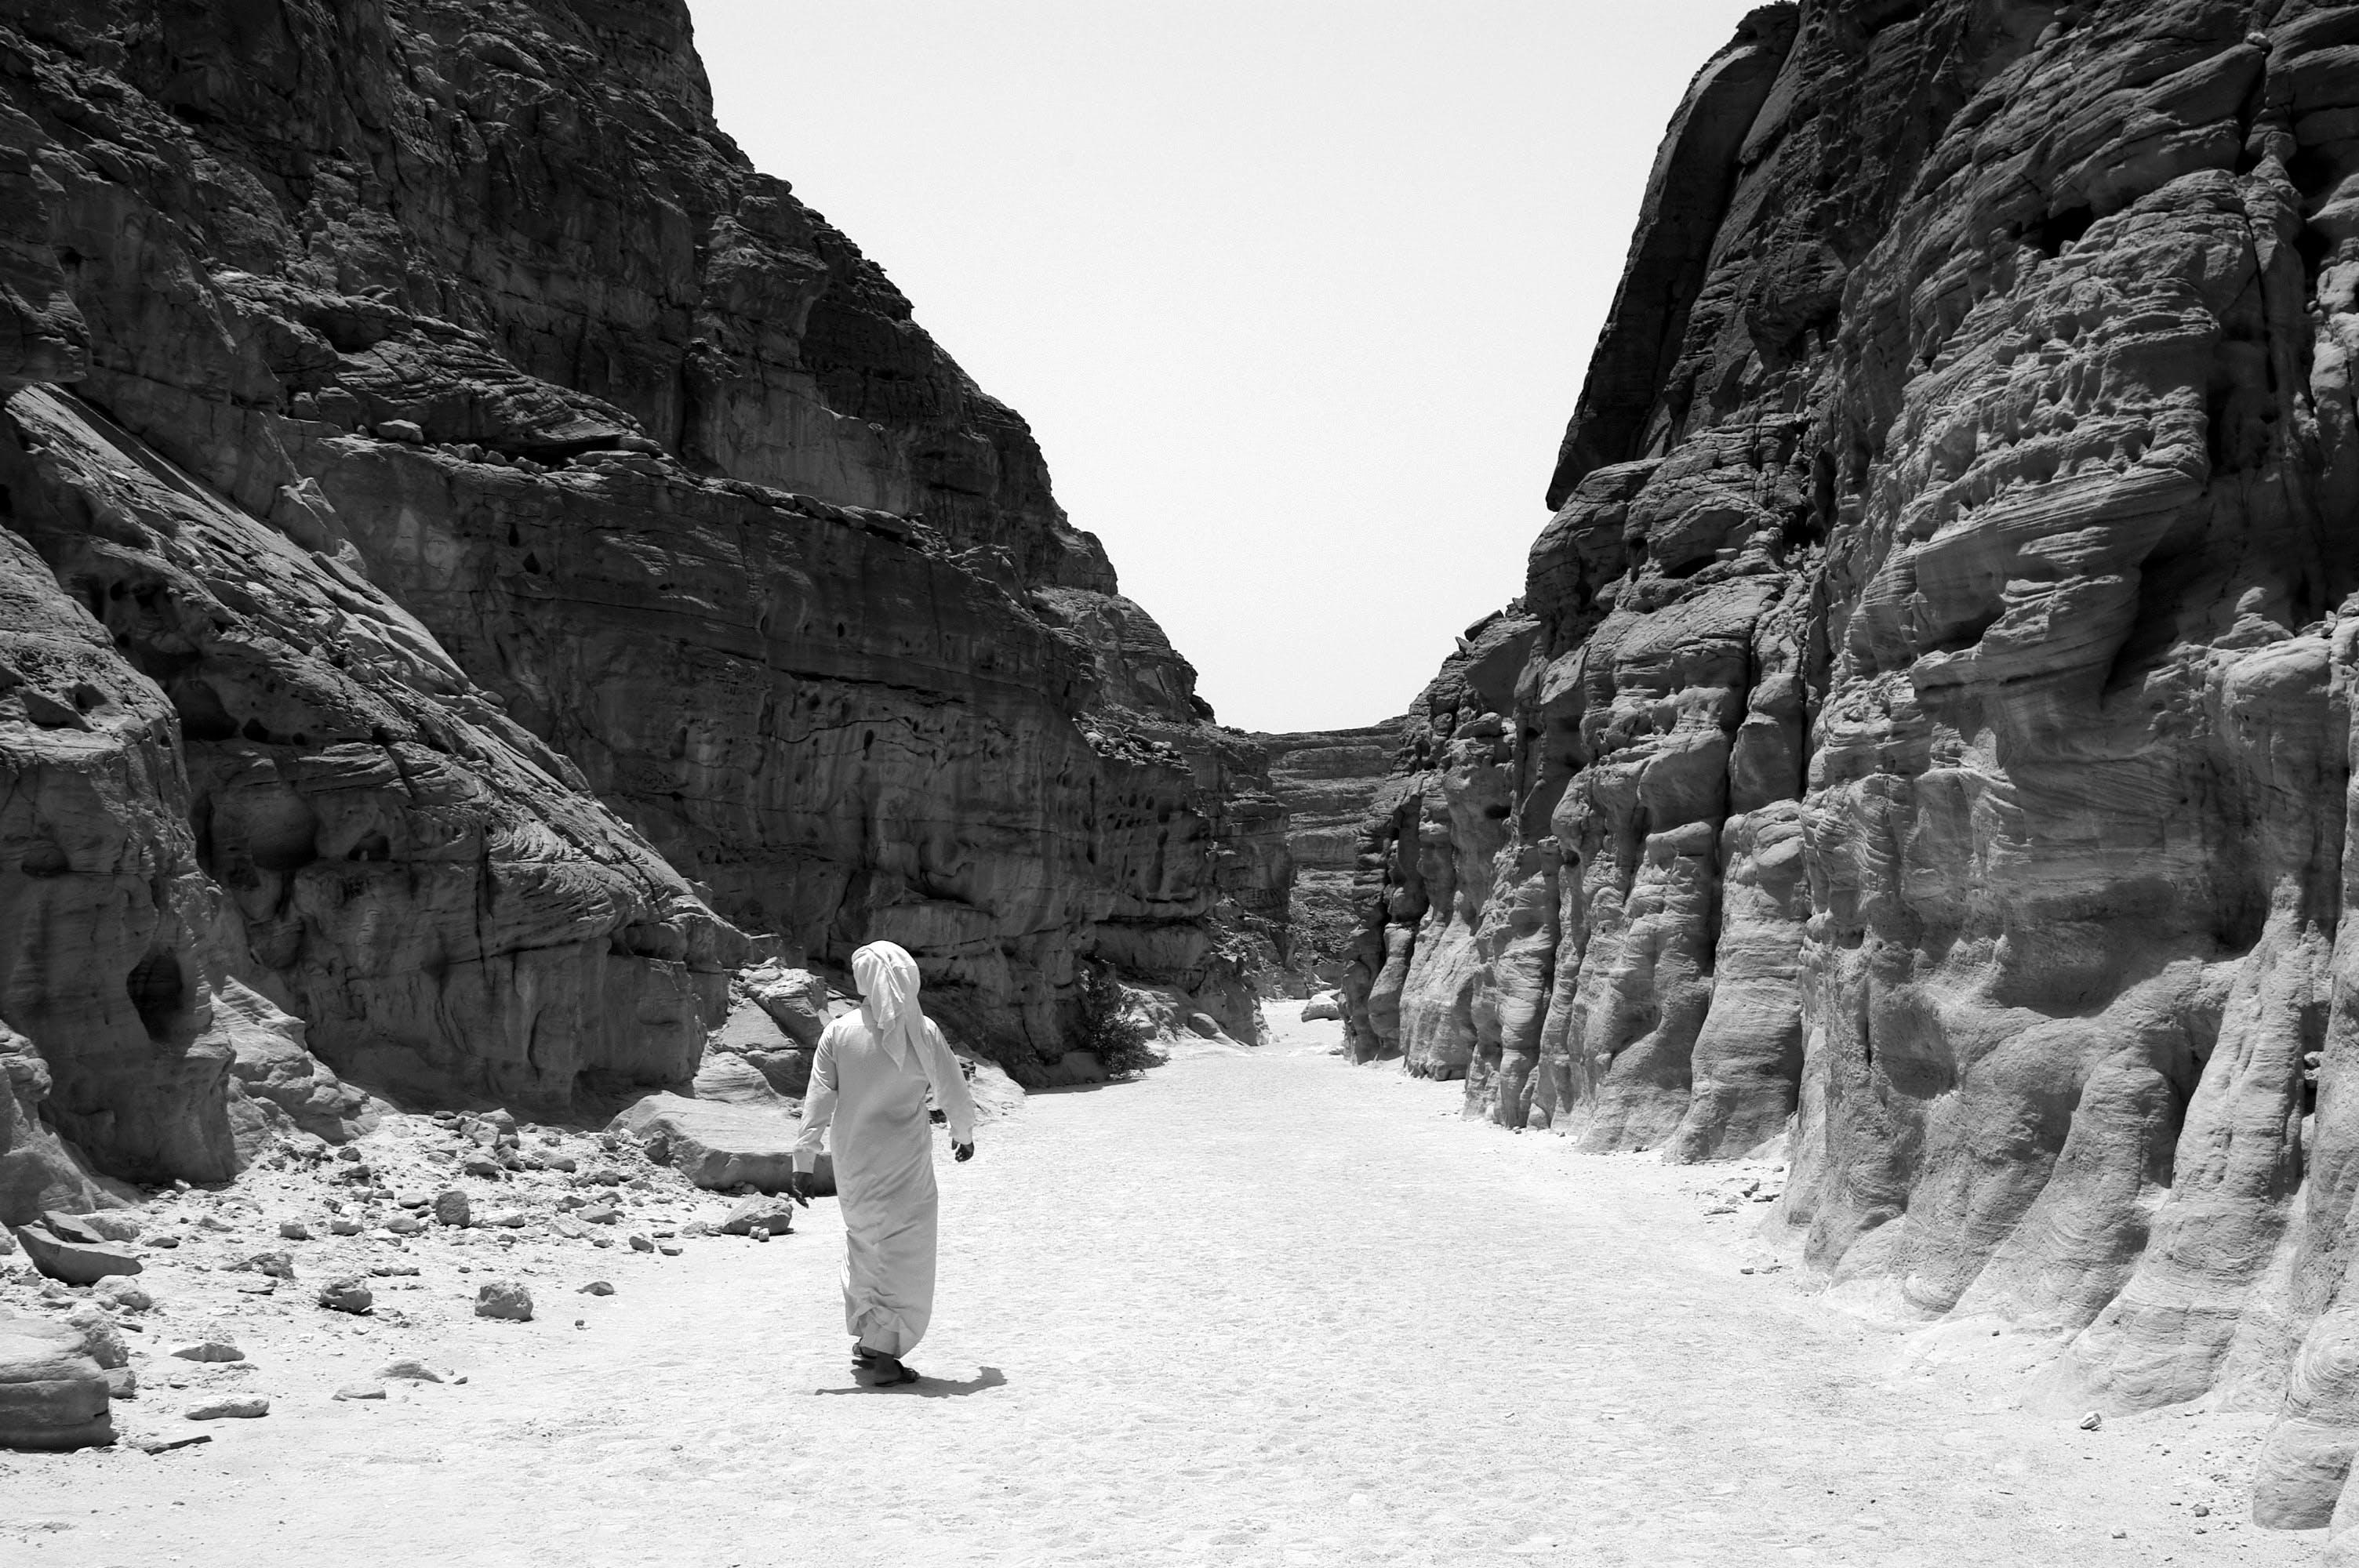 Free stock photo of black and white, desert, Egyptian man, walking